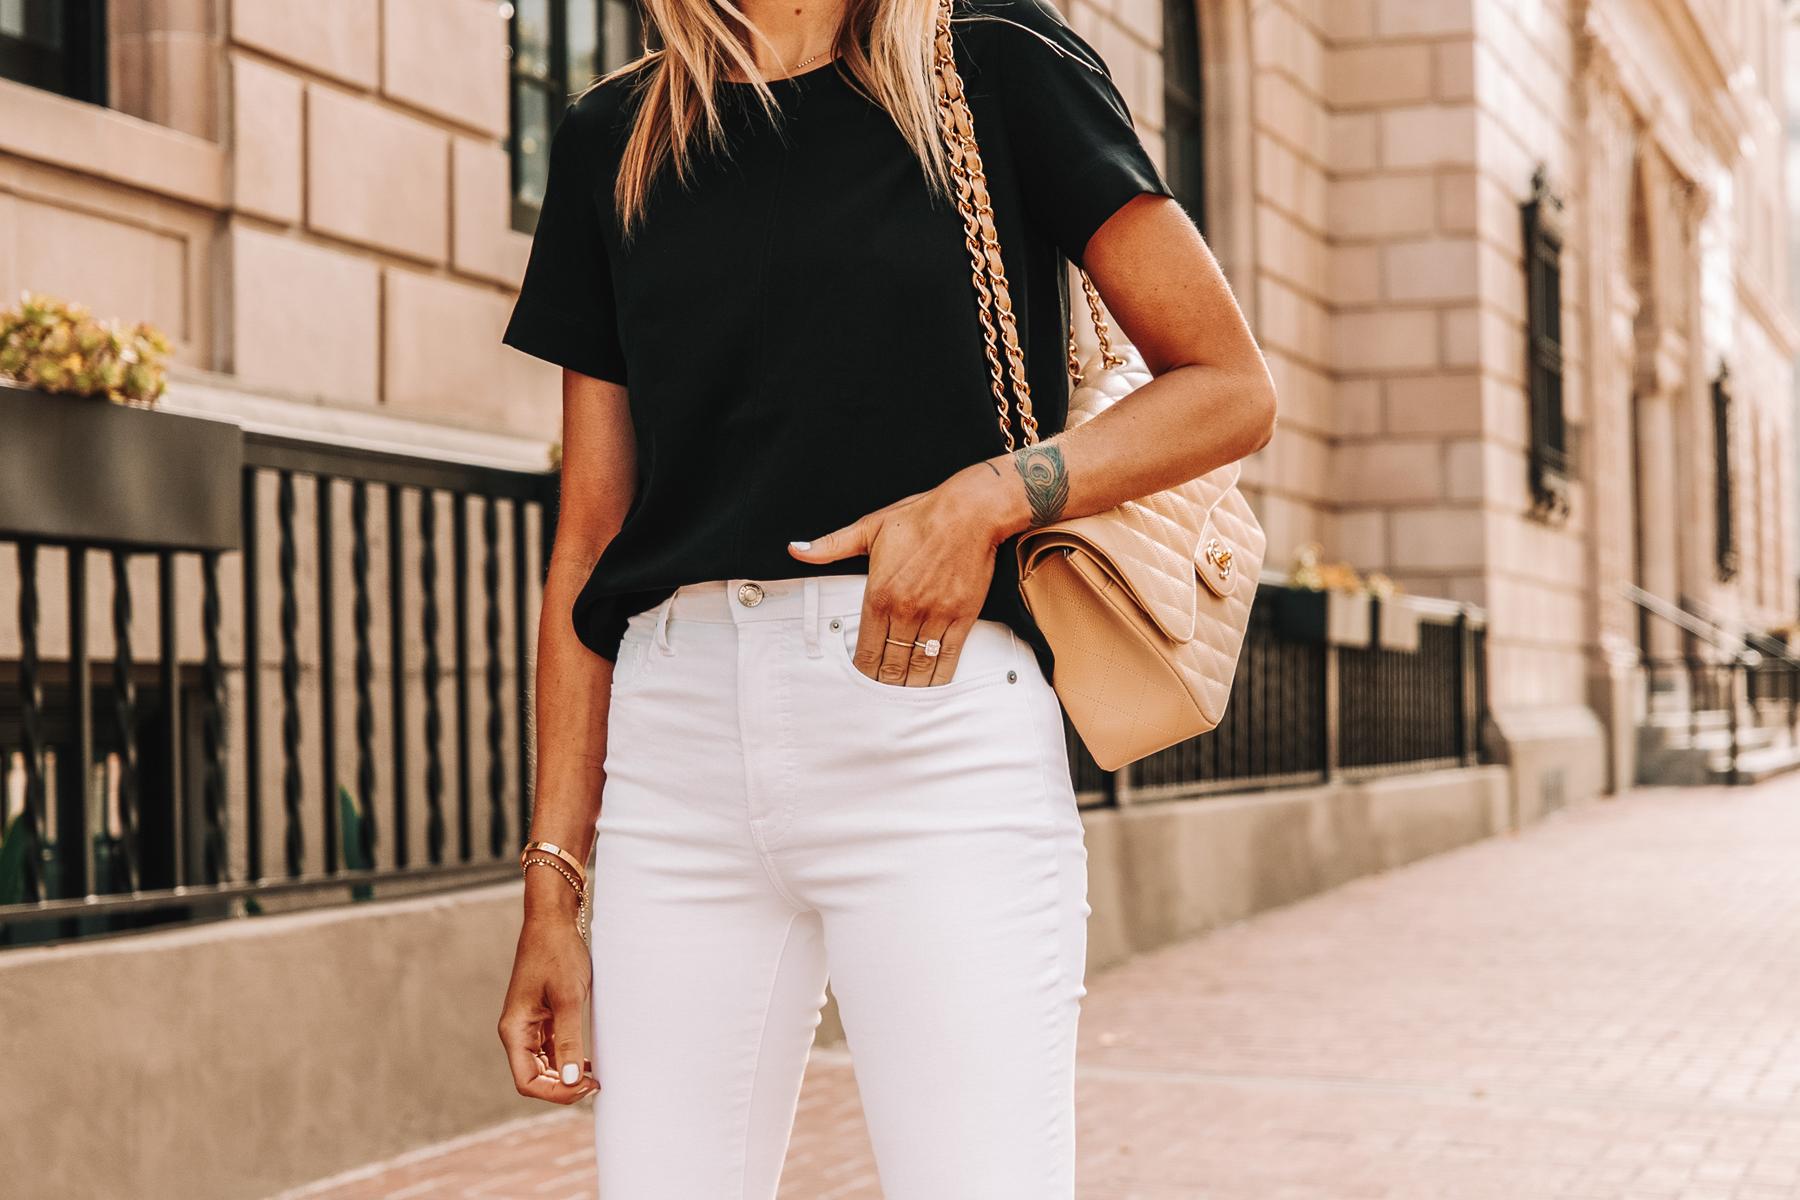 Fashion Jackson Wearing Everlane Black Short Sleeve Top White High Rise Jeans Chanel Beige Handbag 1